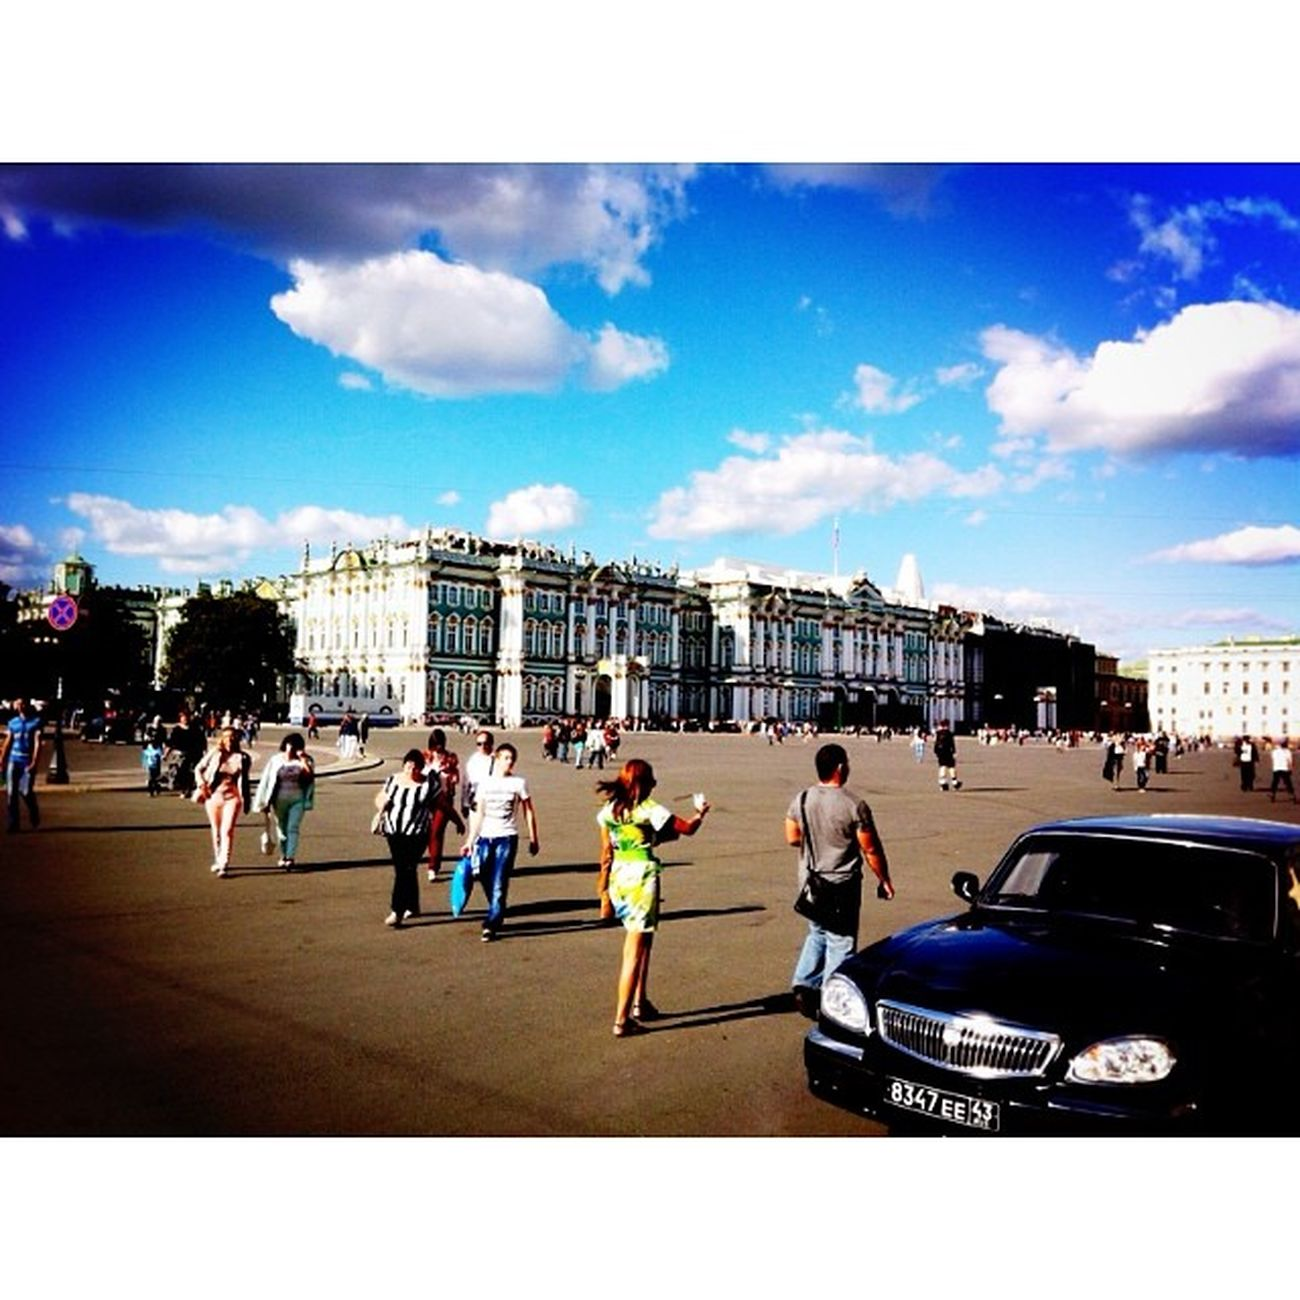 дворцоваяплощадь эрмитаж ленинград СанктПетербург питер петербург спб небо облака spb peterburg piter leningrad